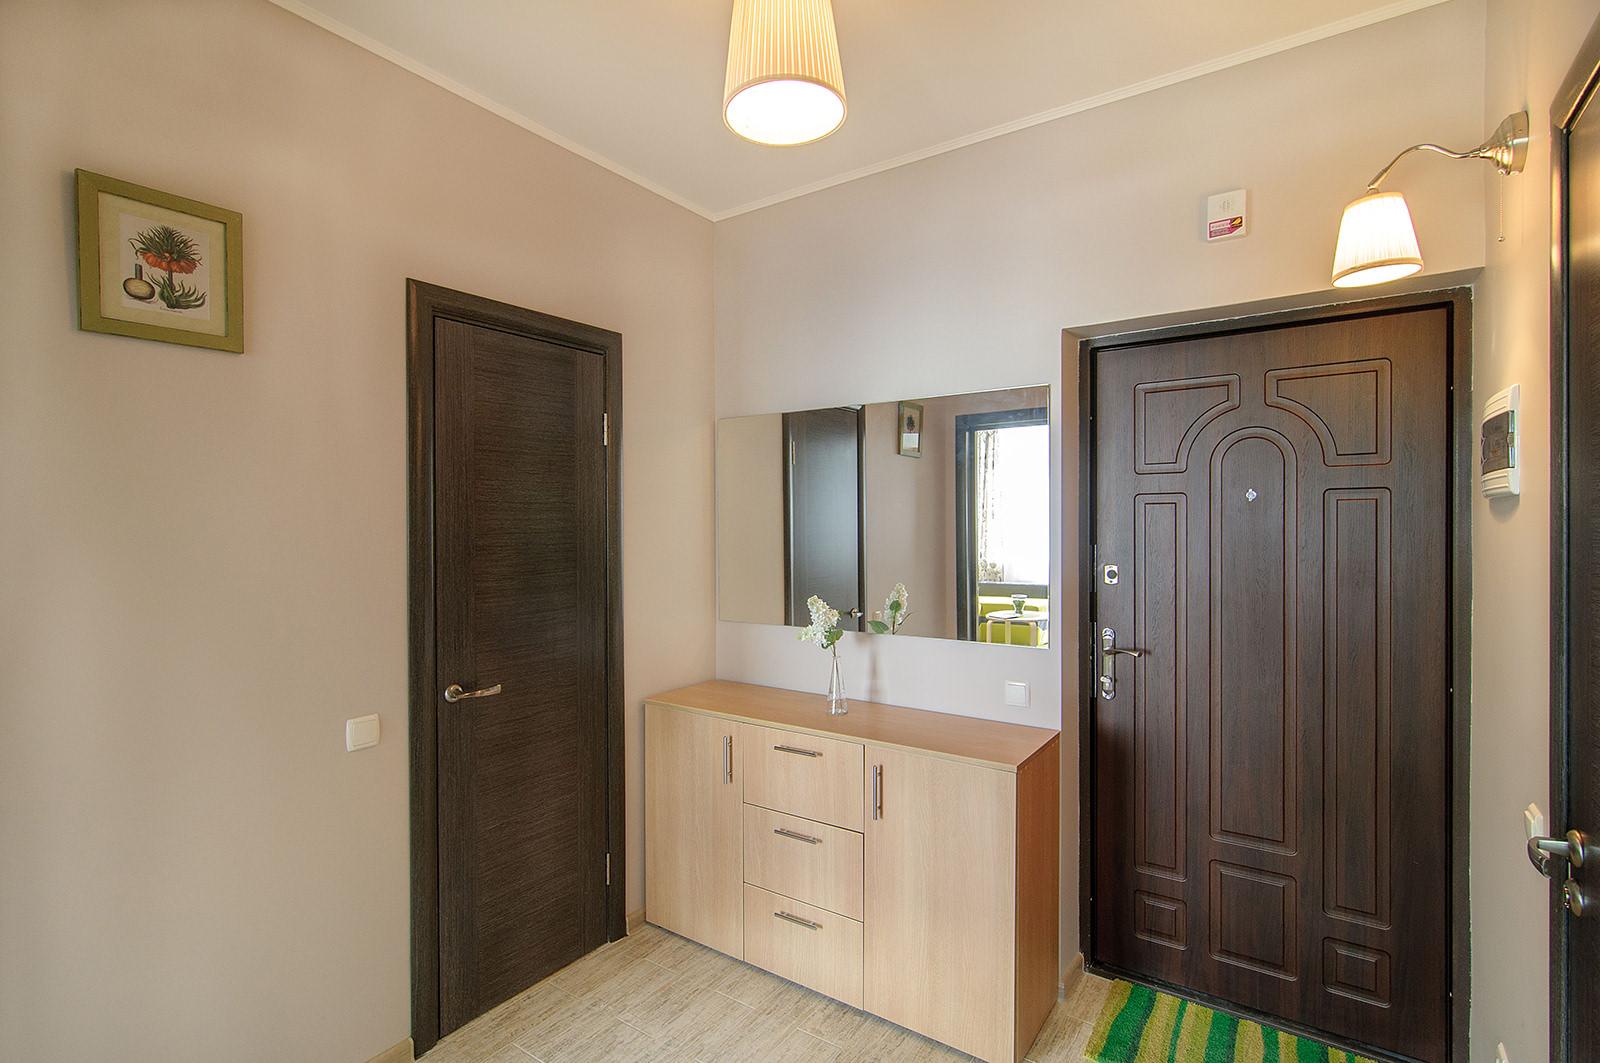 ednostaen-apartament-s-moderen-i-uiuten-interior-42-m-7g